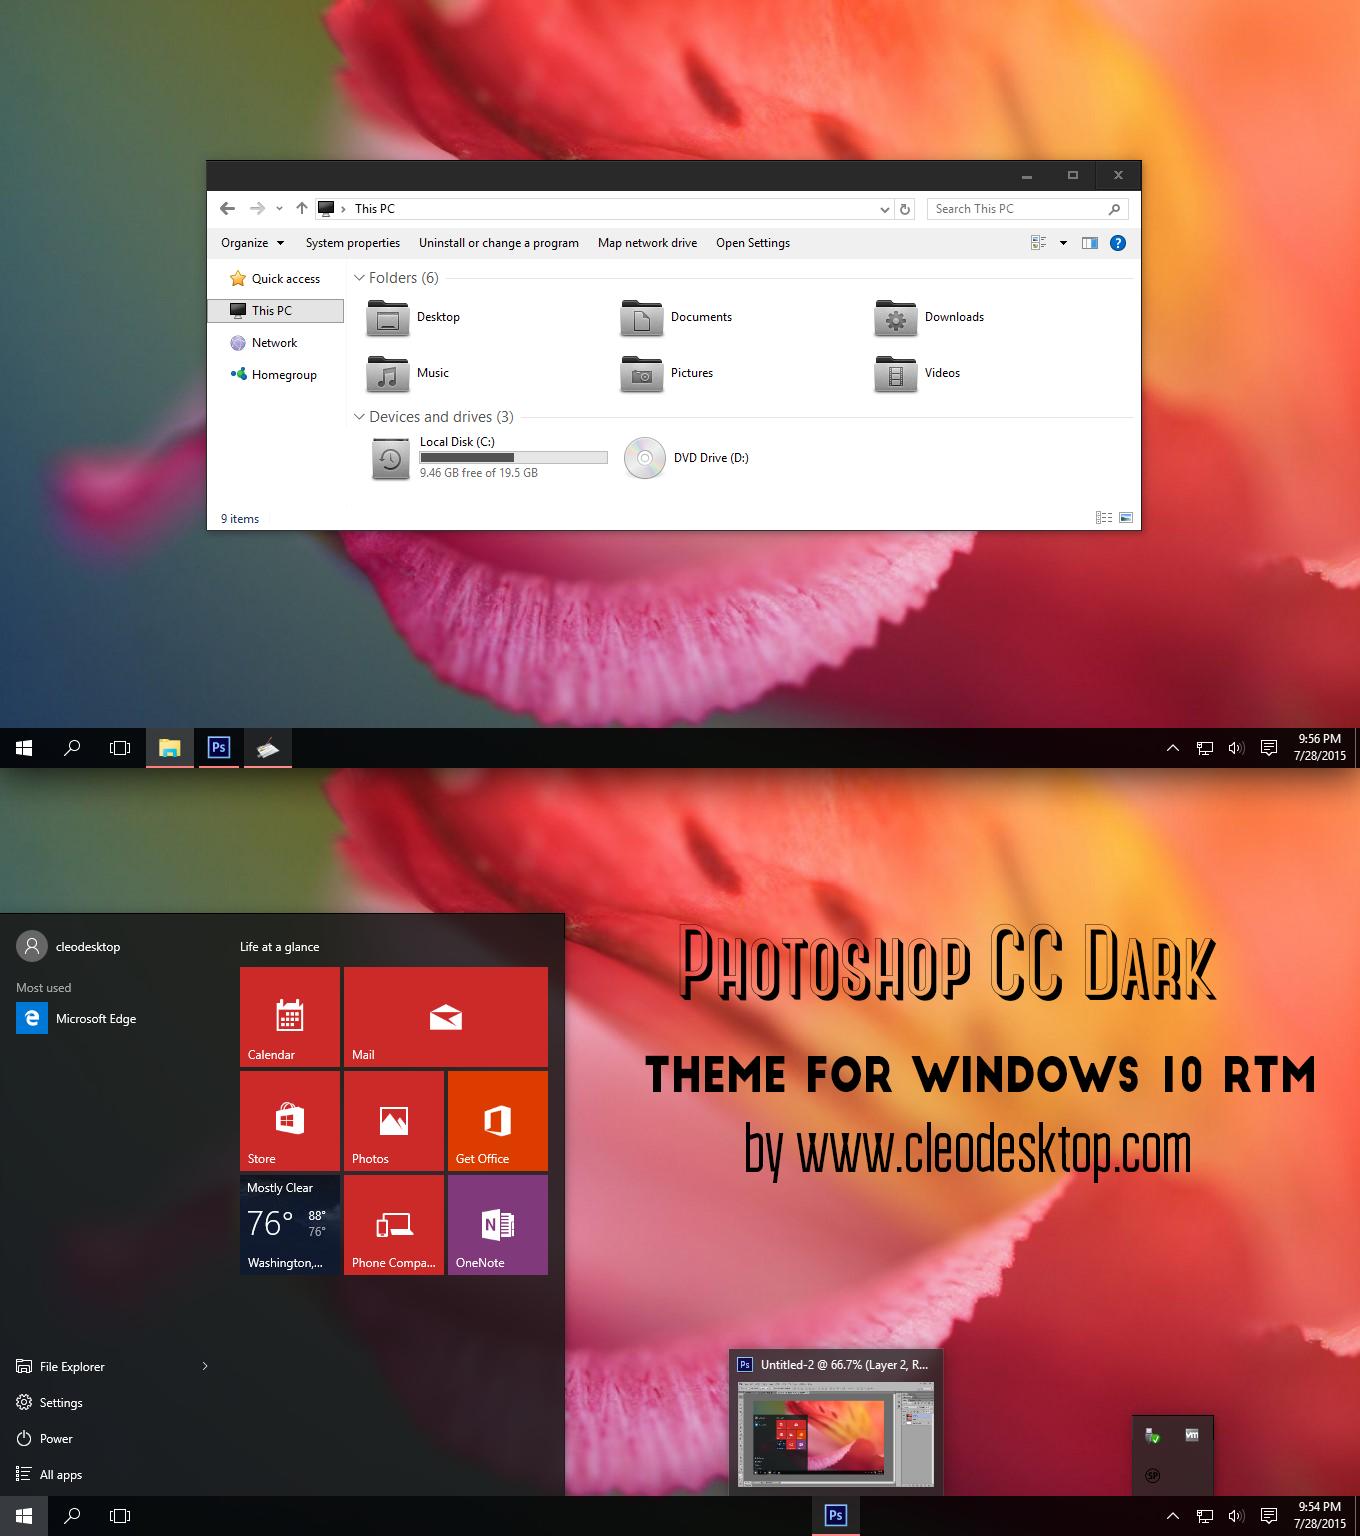 Photoshop CC Dark Theme Windows 10 RTM